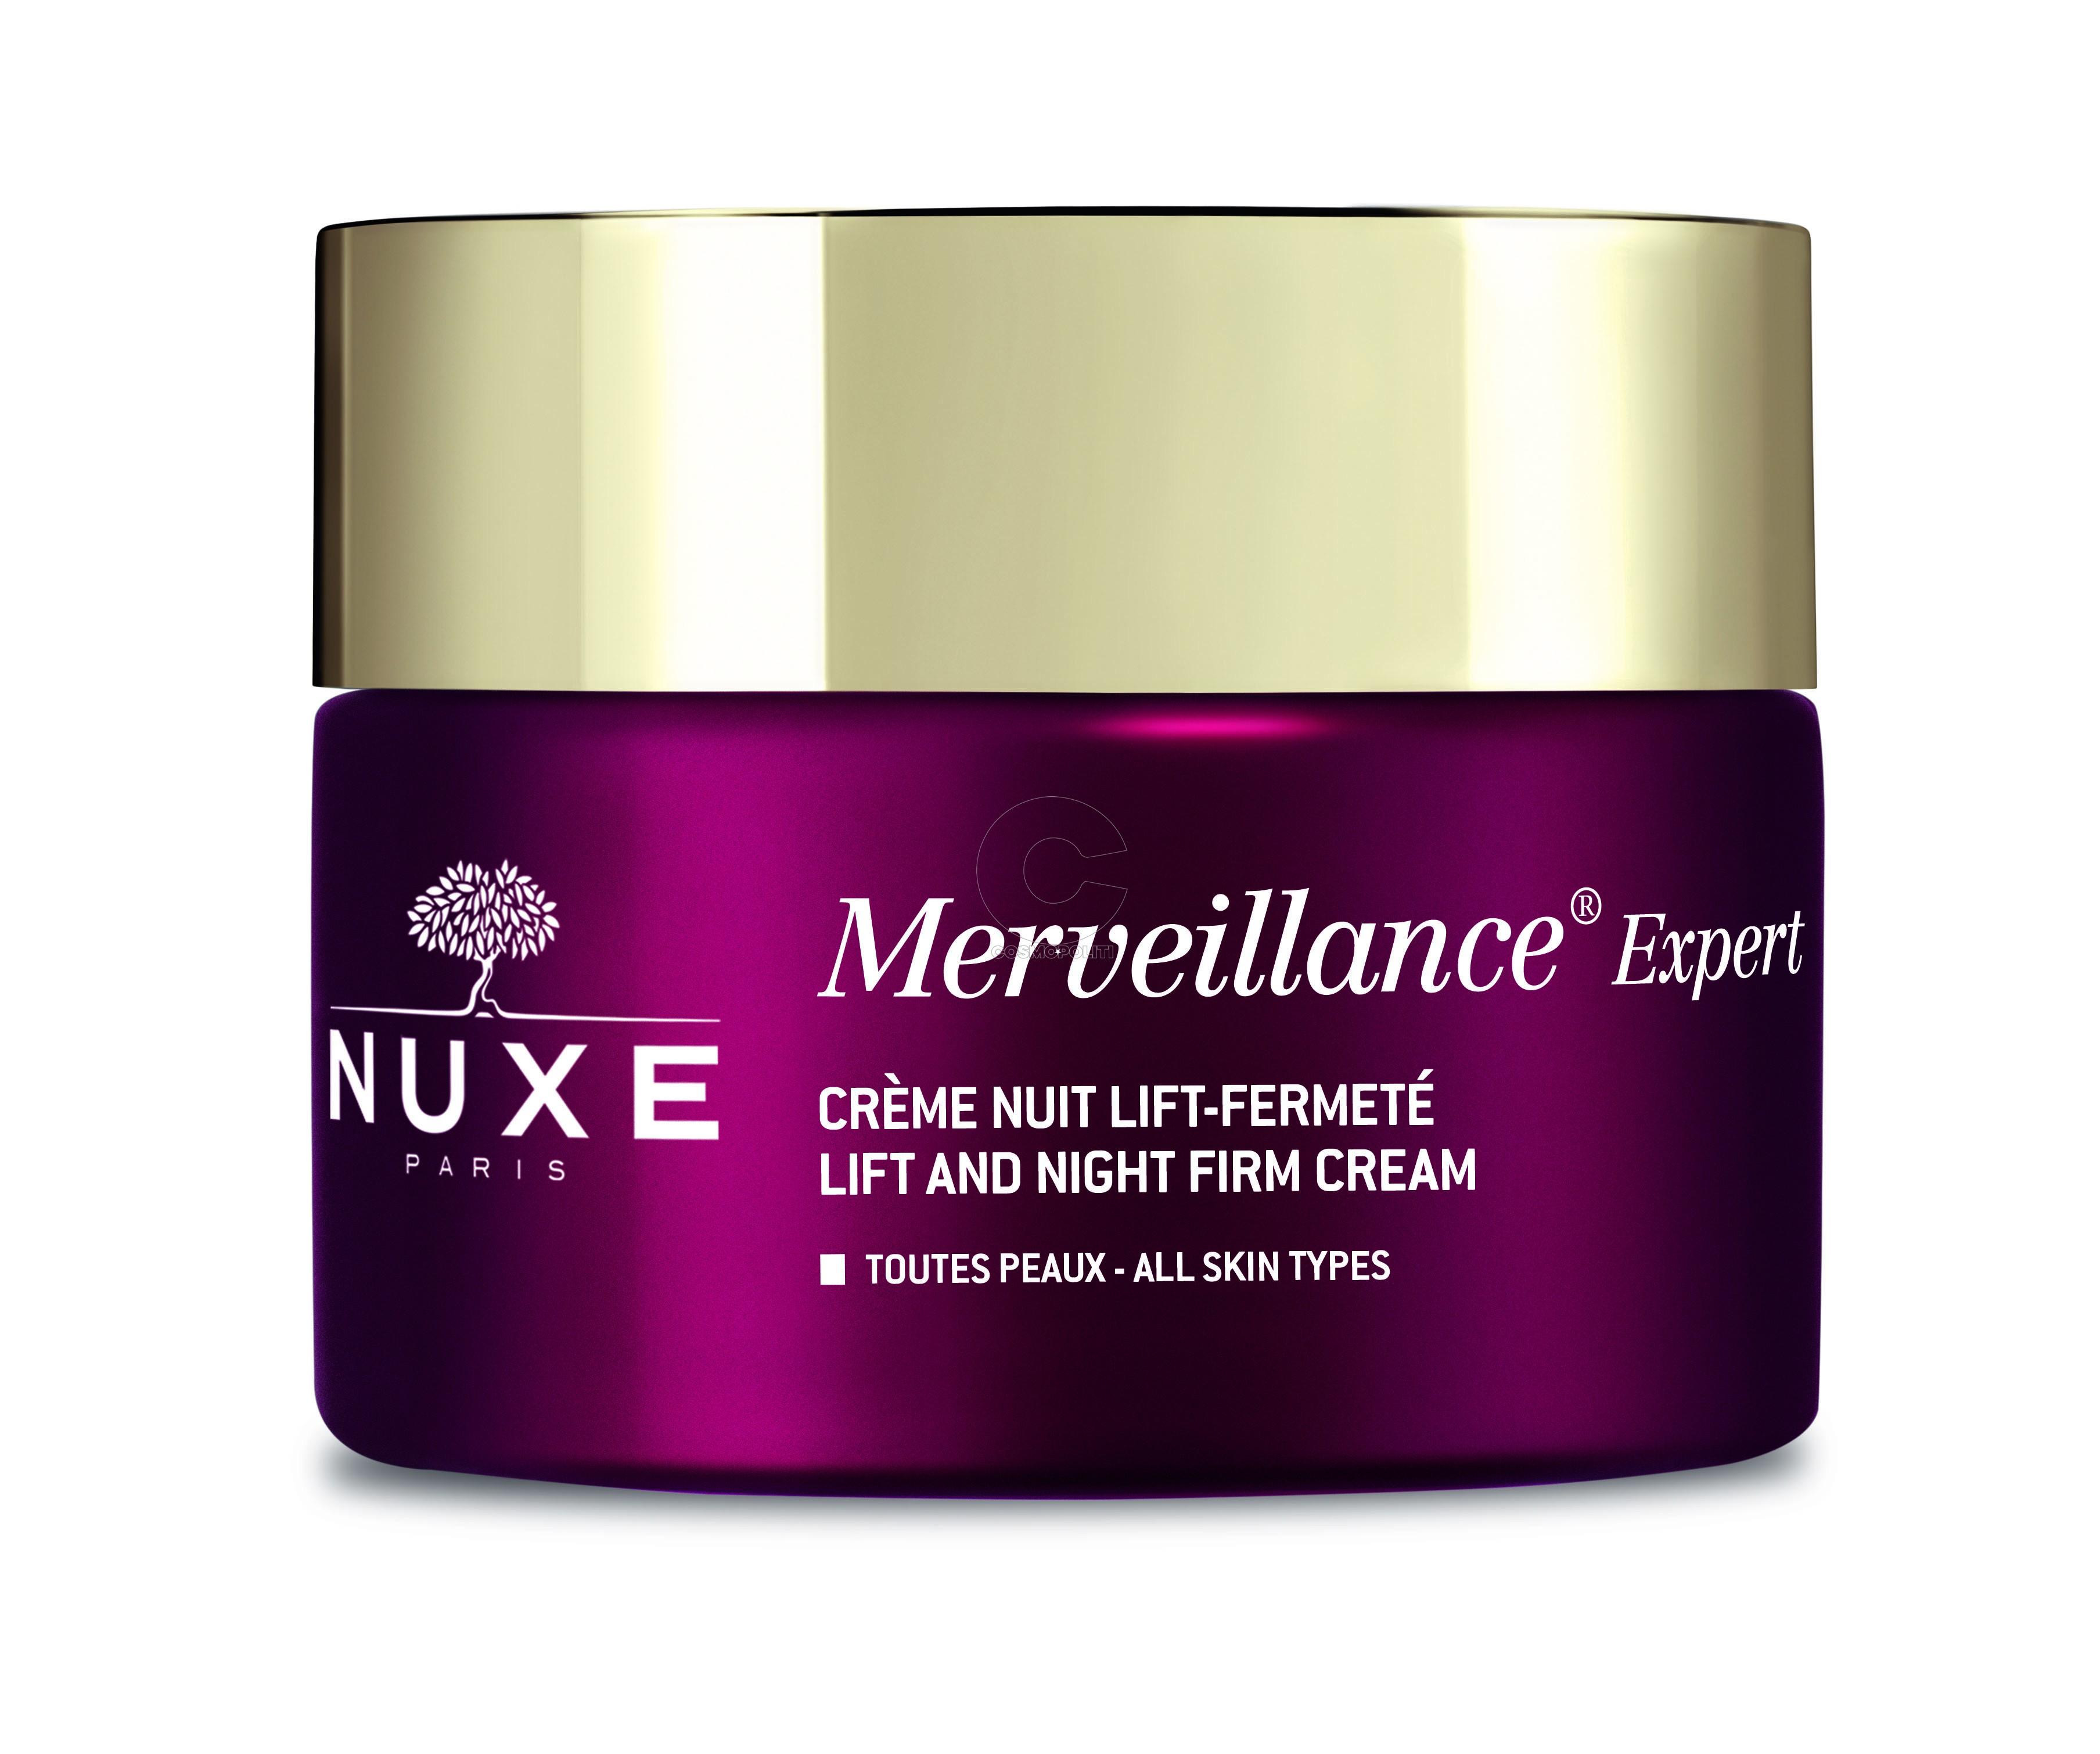 MERVEILLANCE EXPERT - Crème Lift Nuit